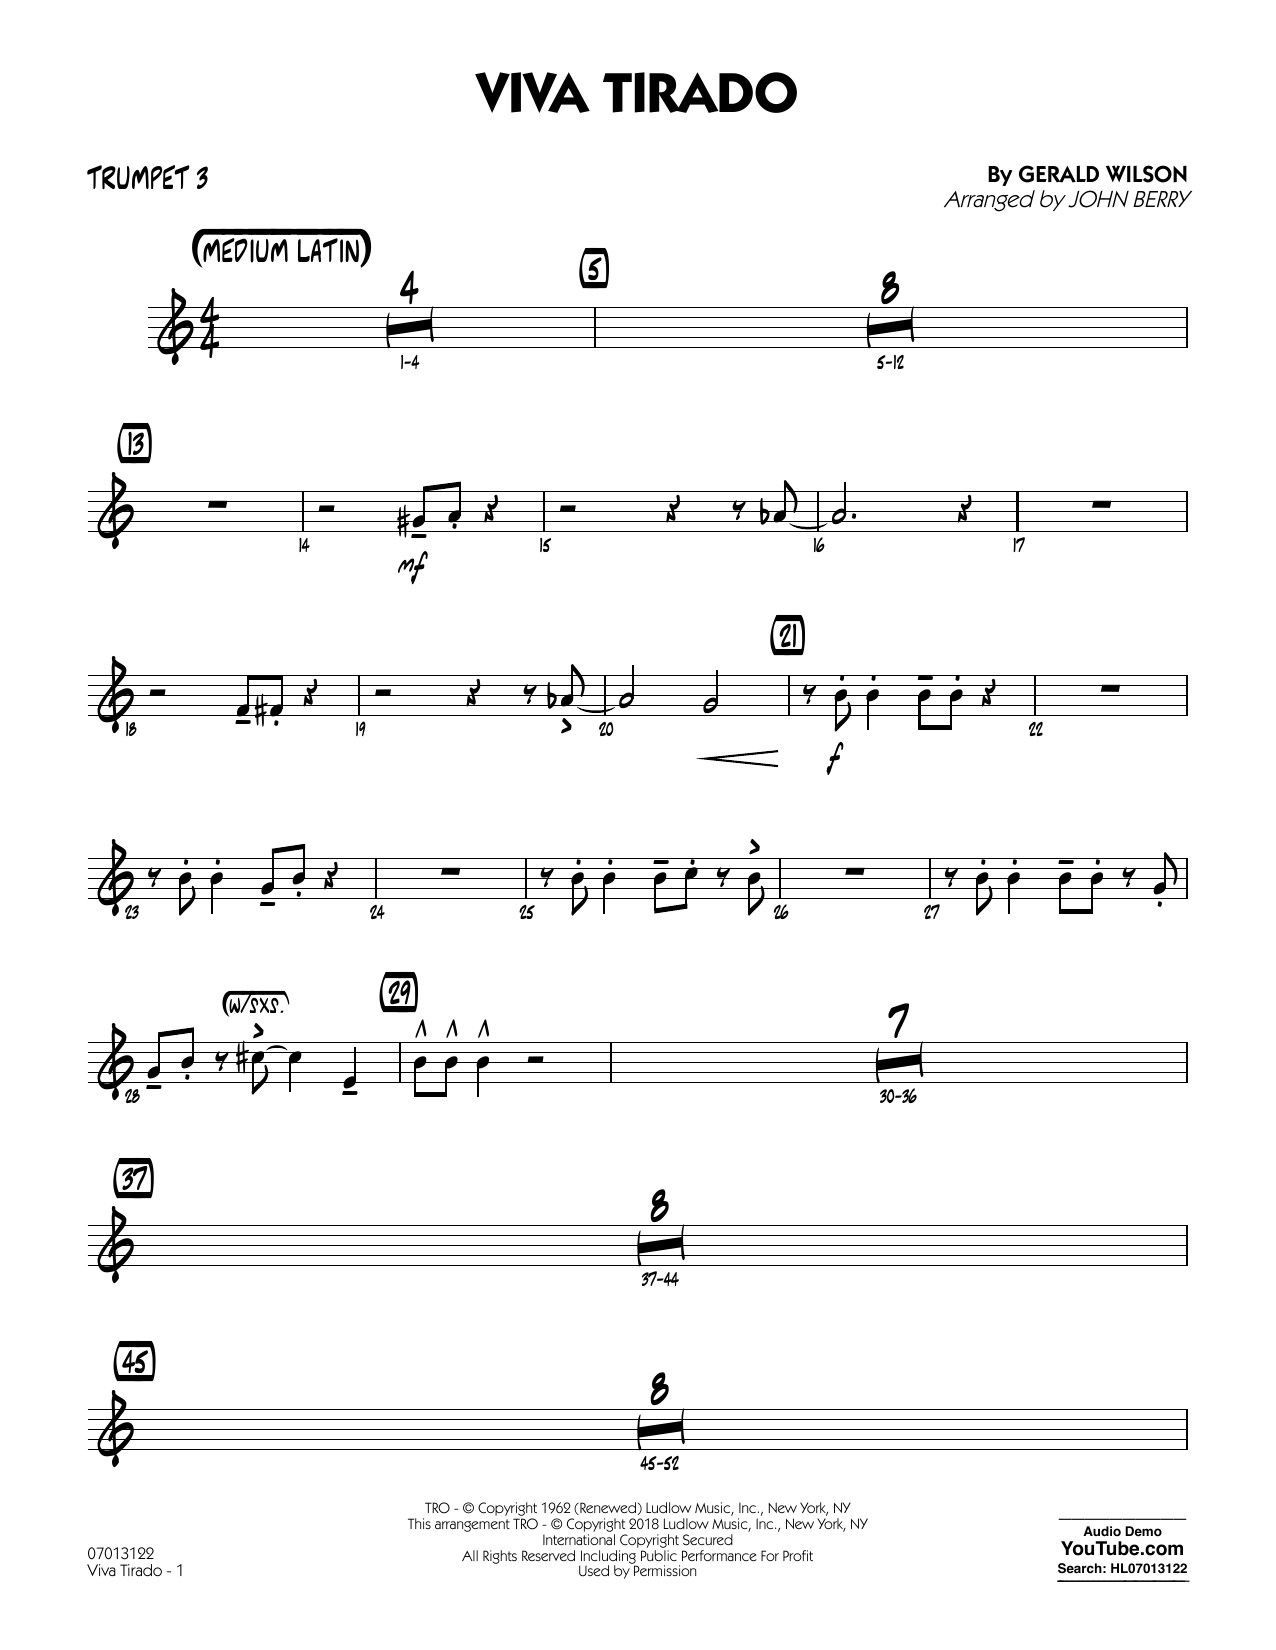 John Berry Viva Tirado - Trumpet 3 sheet music notes and chords. Download Printable PDF.